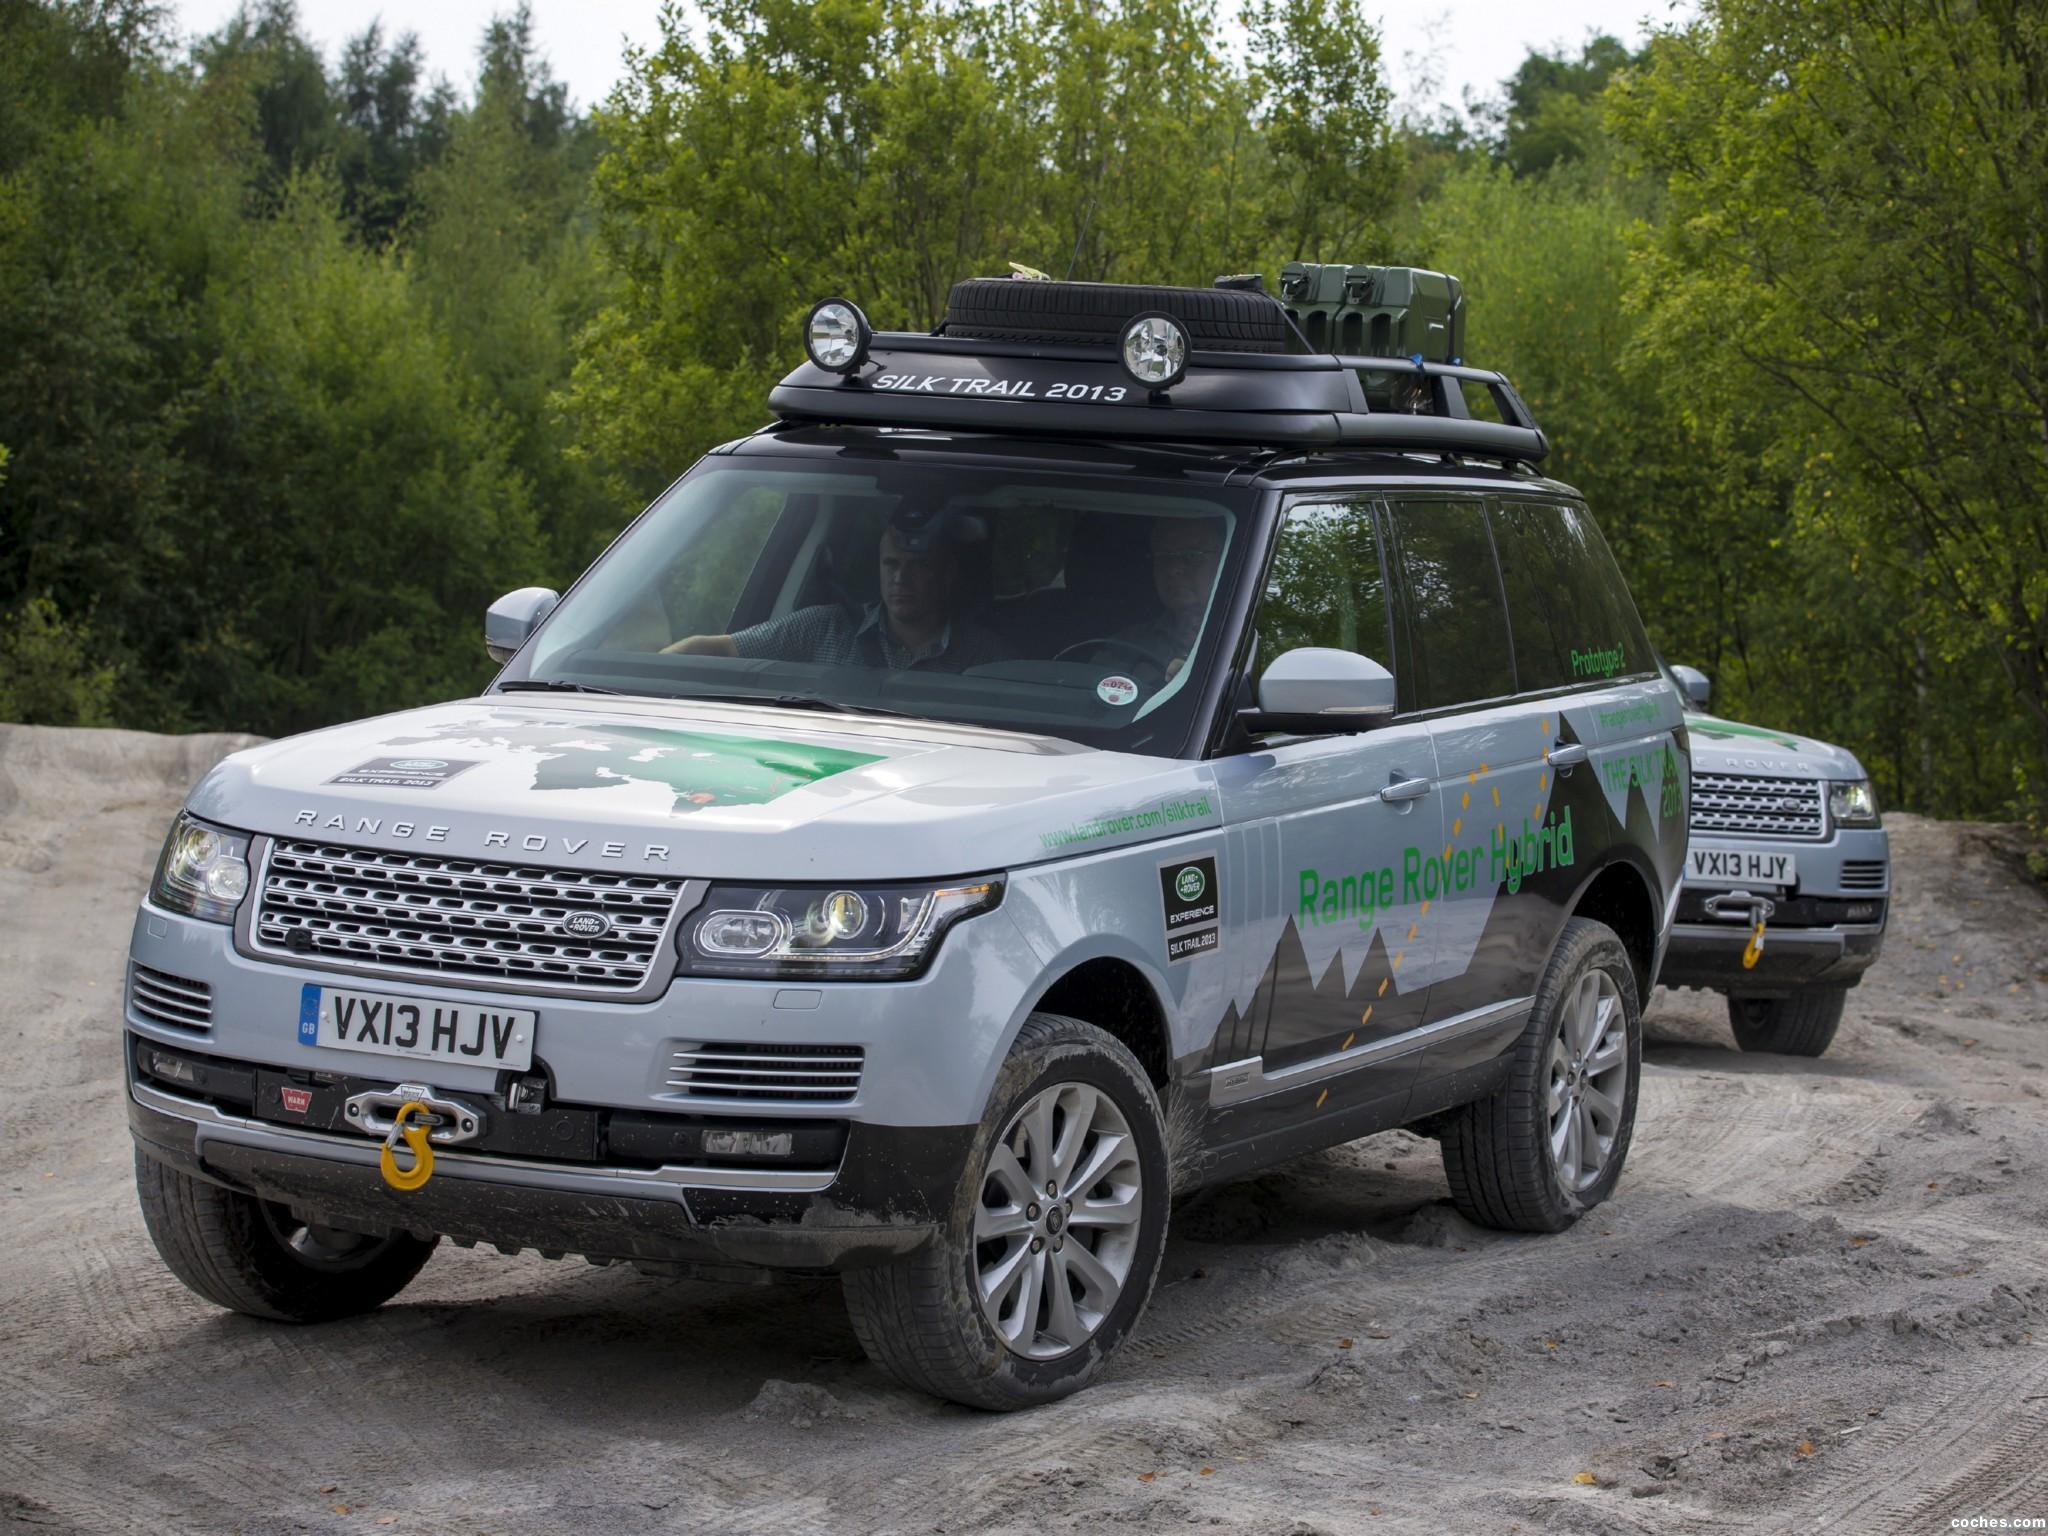 Foto 14 de Land Rover Range Rover Hybrid Prototype L405 2013